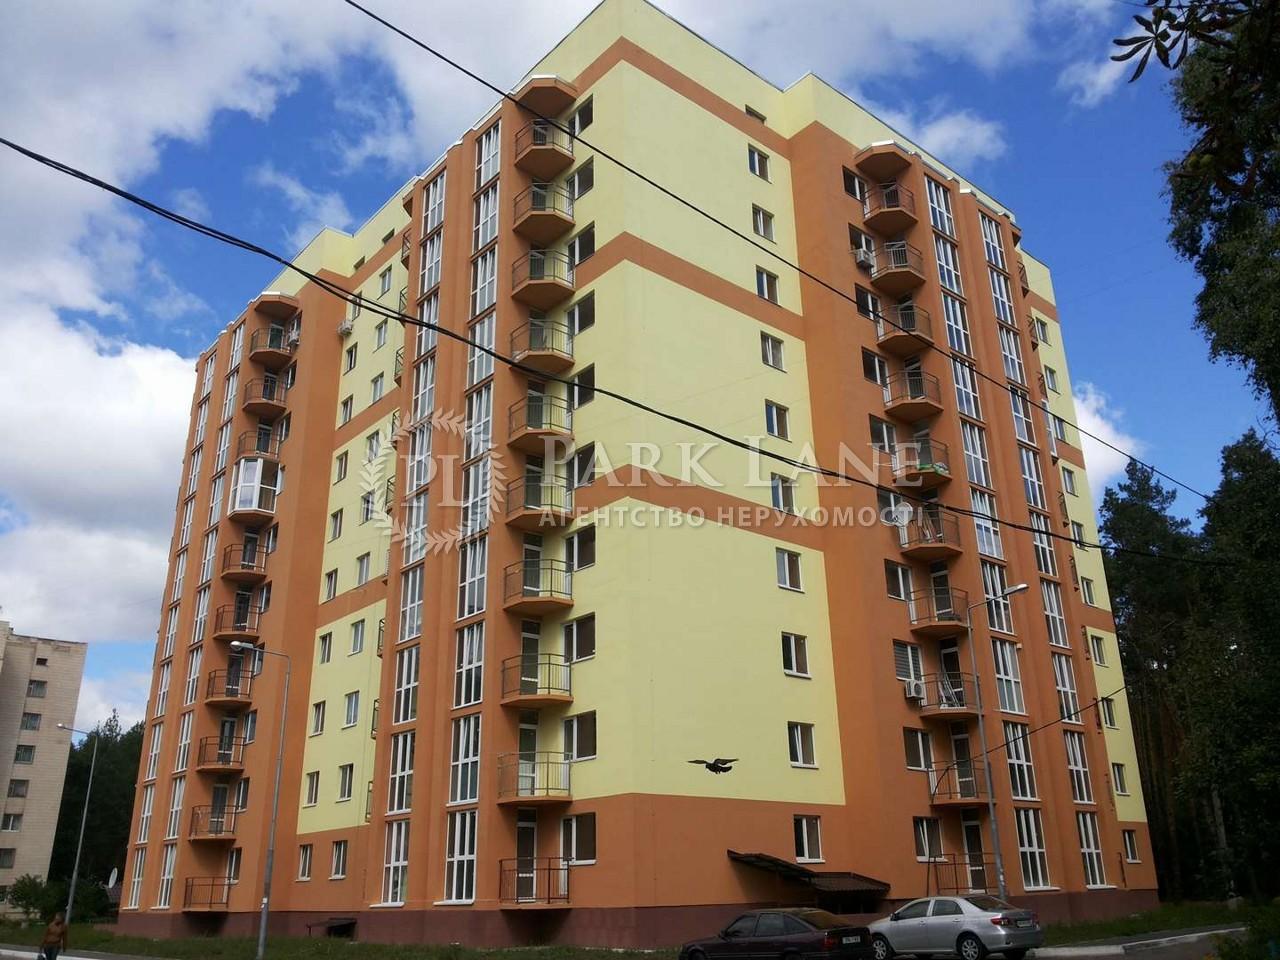 Квартира вул. Матикіна Генерала, 16, Київ, A-96500 - Фото 1